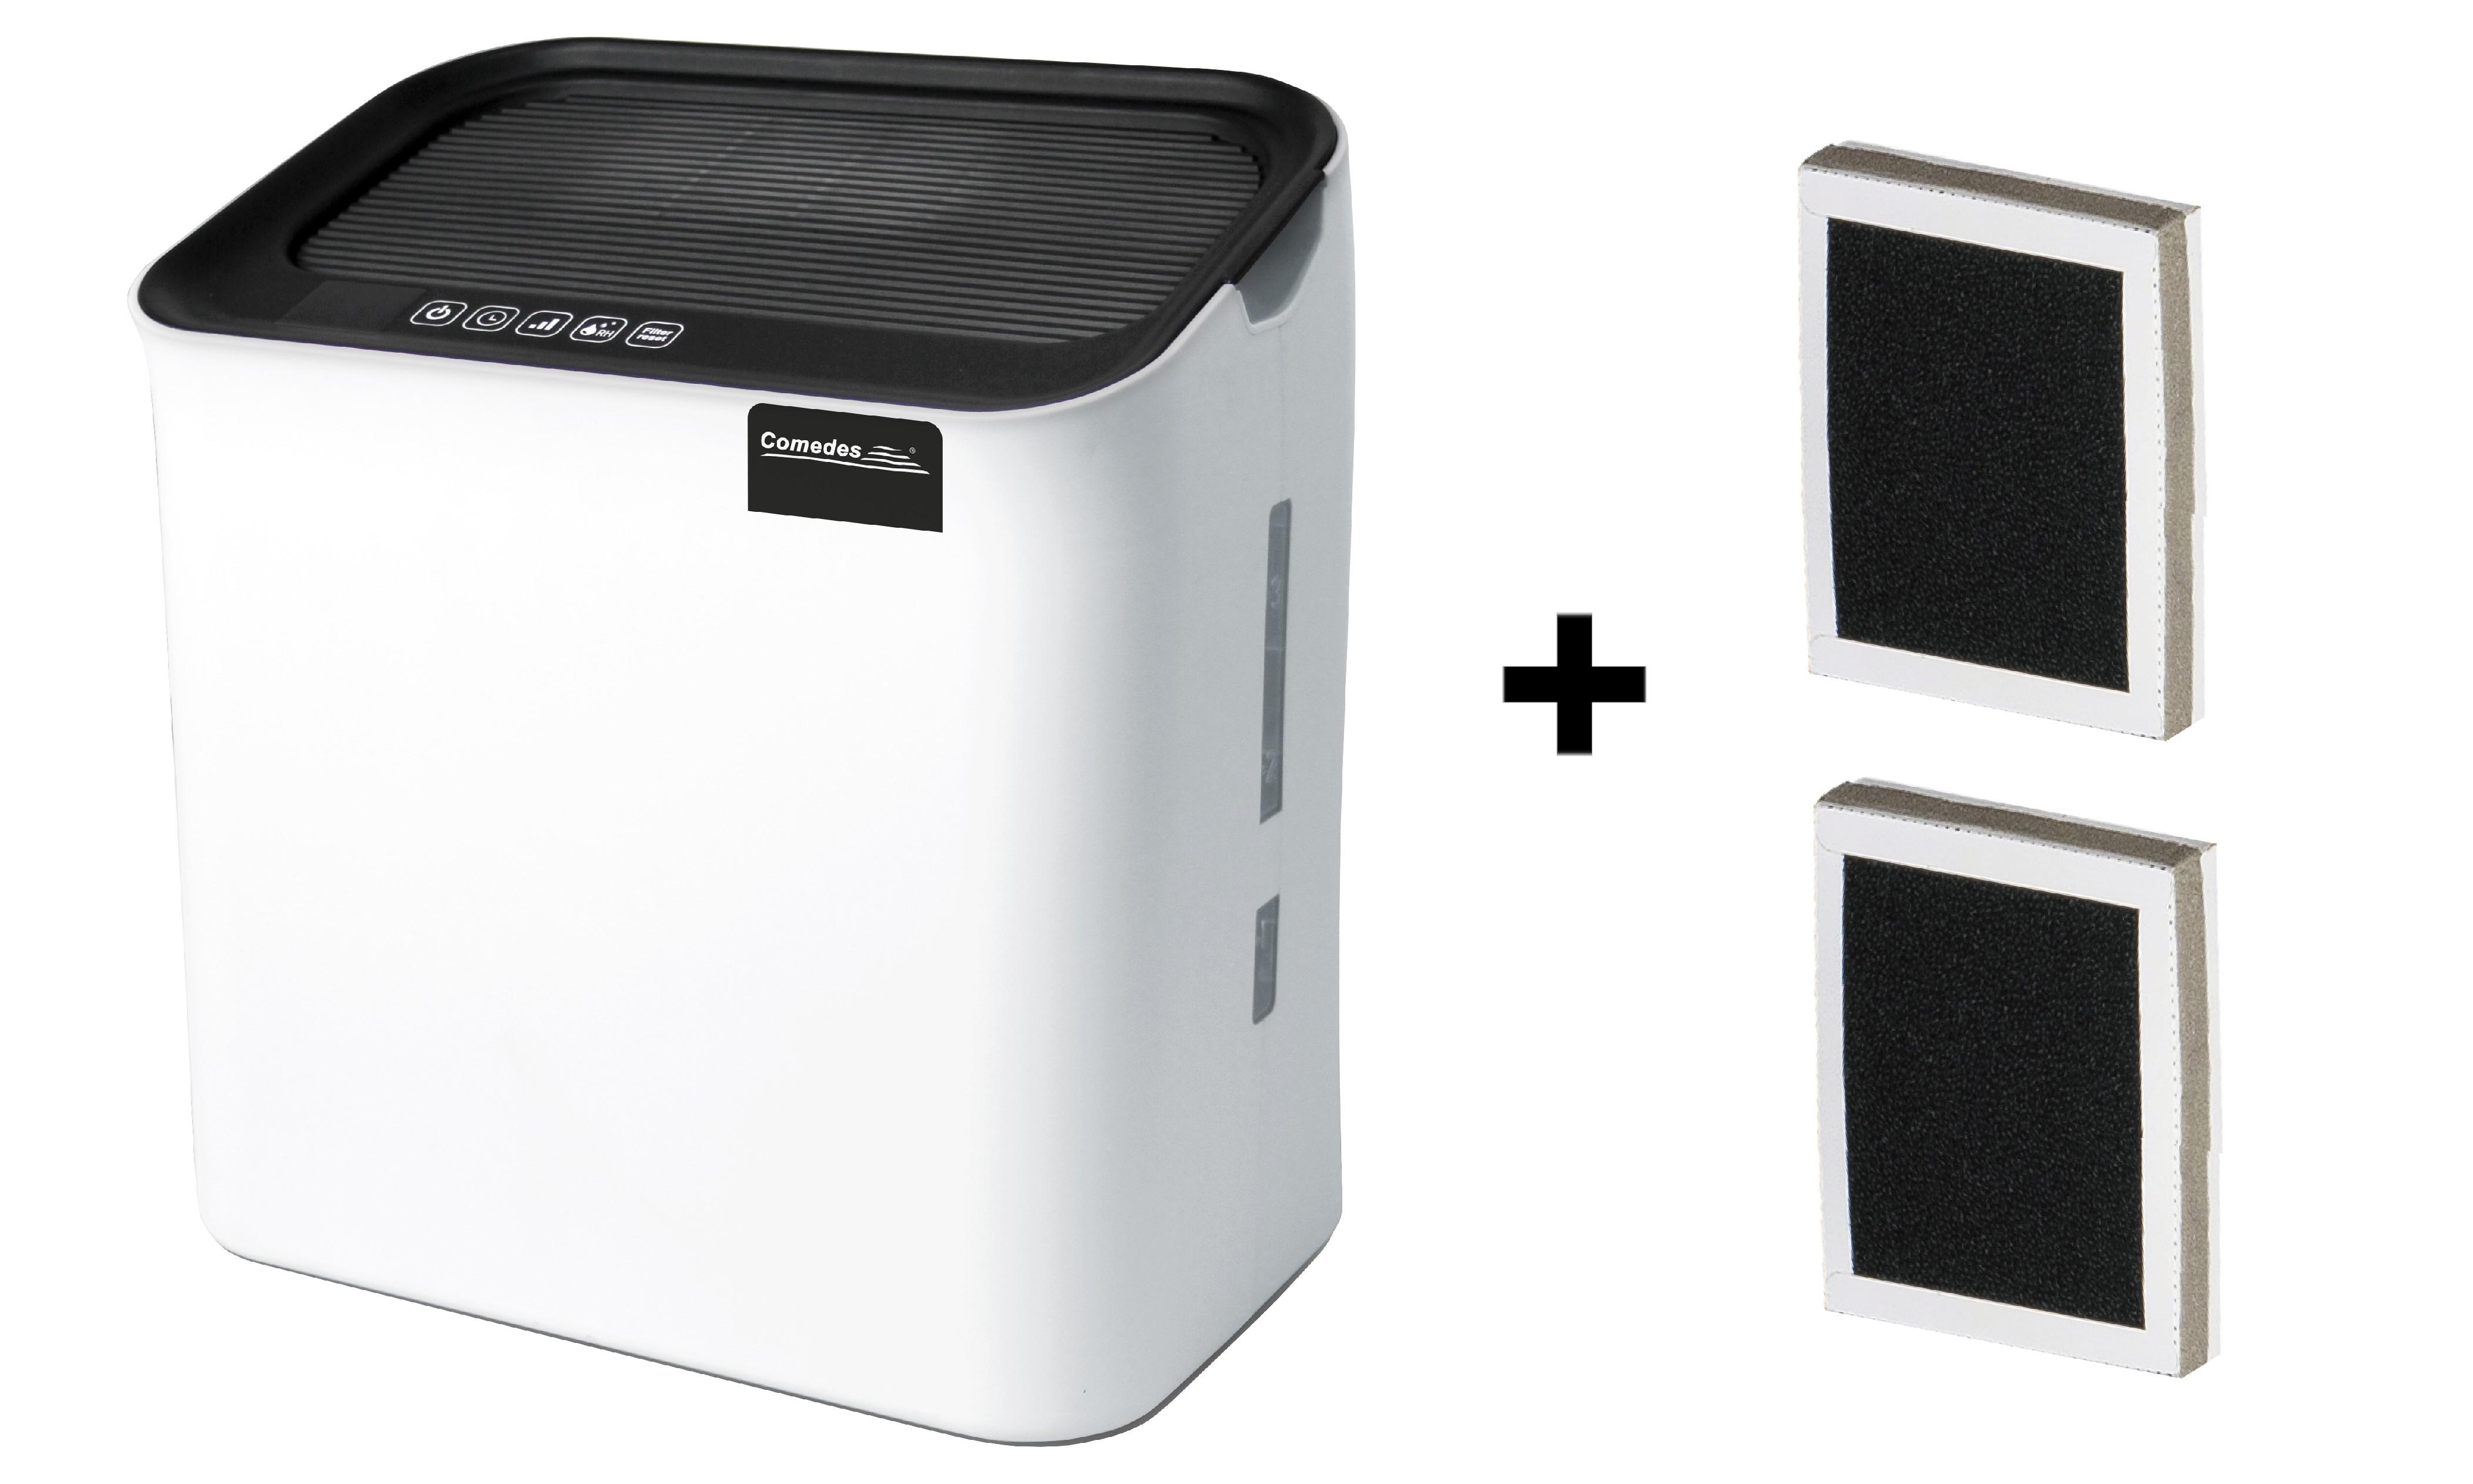 Zvlhčovač vzduchu s HEPA filtrem Comedes Hildegard LW 360 + 2x náhradní filtr Čistička vzduchu a zvlhčovač 2v1